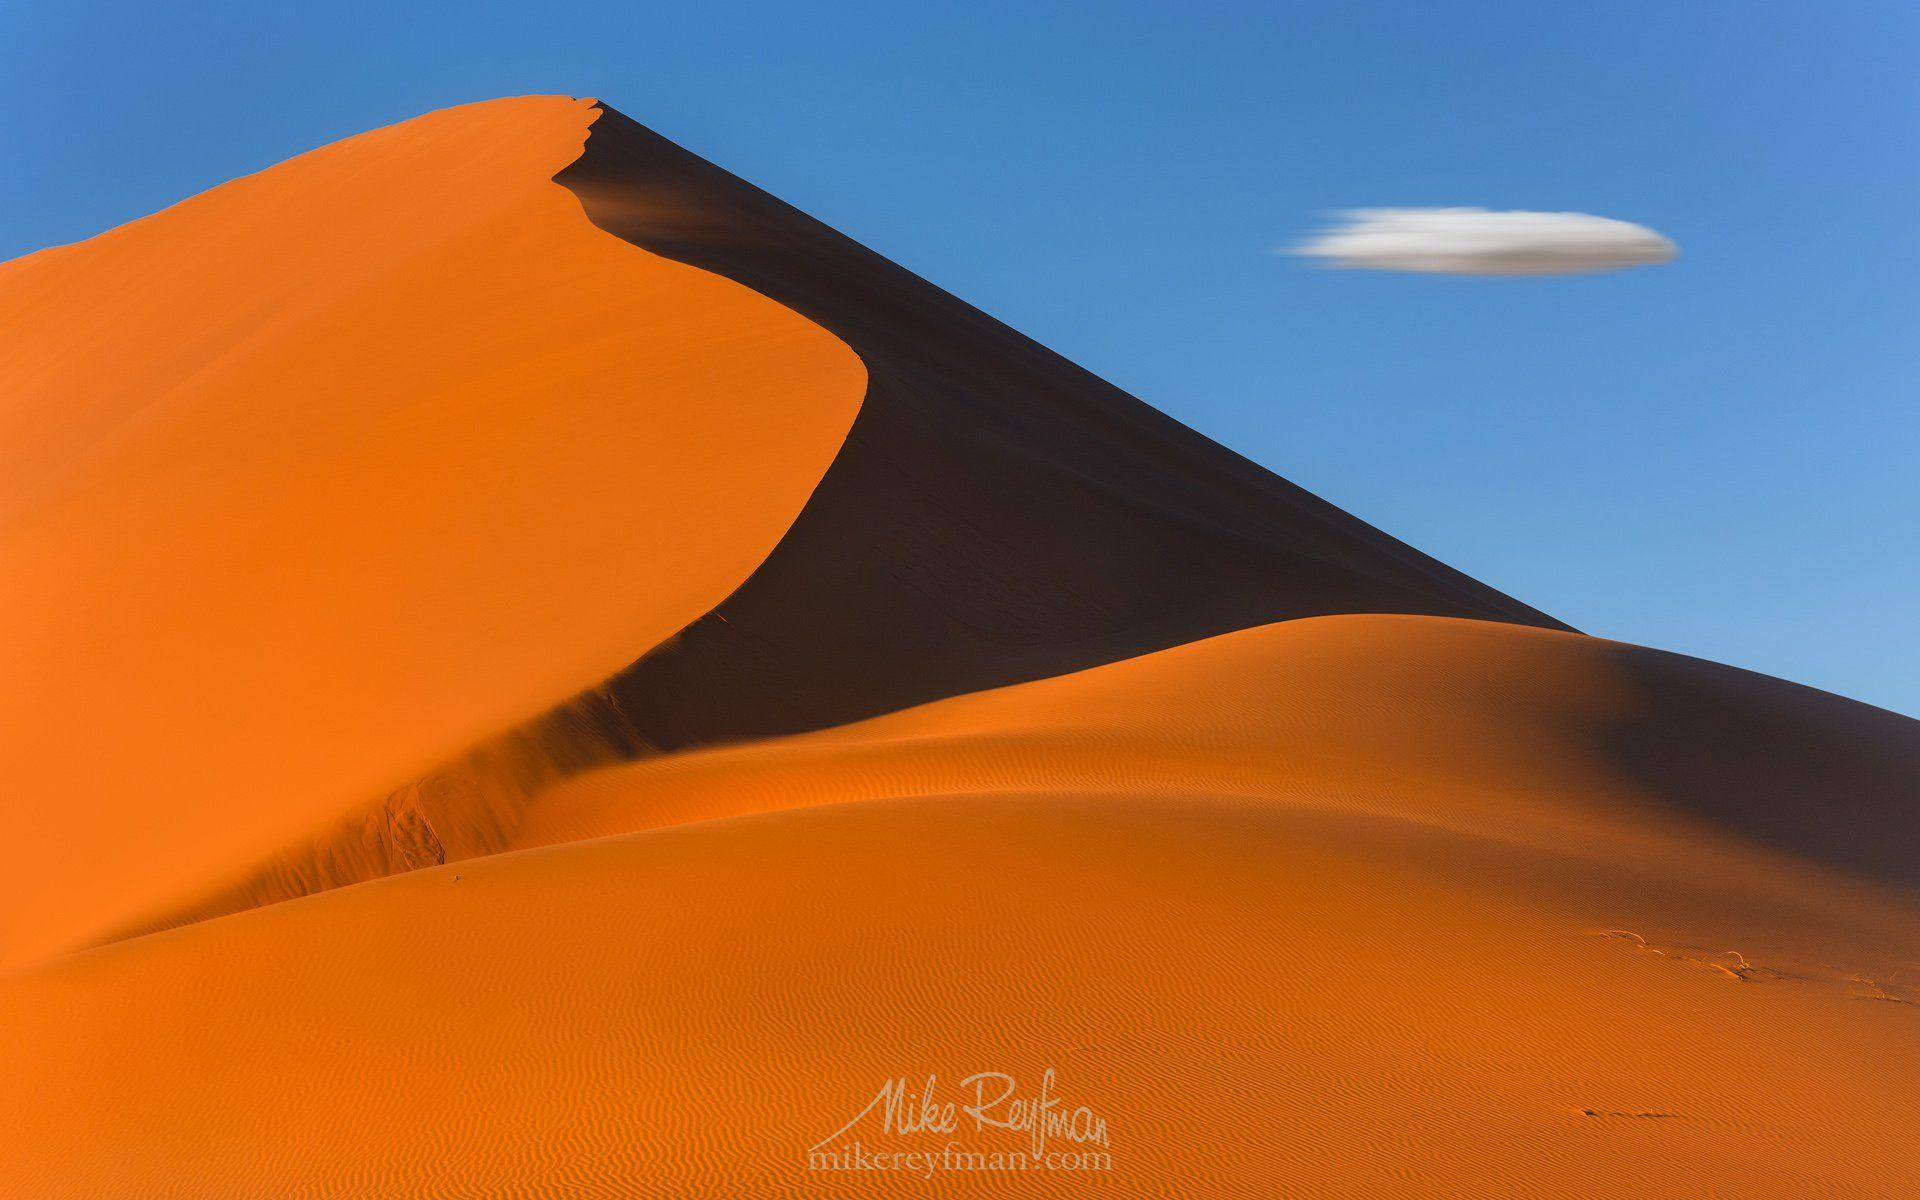 sossusvlei dunes, namib-naukluft national park, sesriem, namibia, aerial, Майк Рейфман